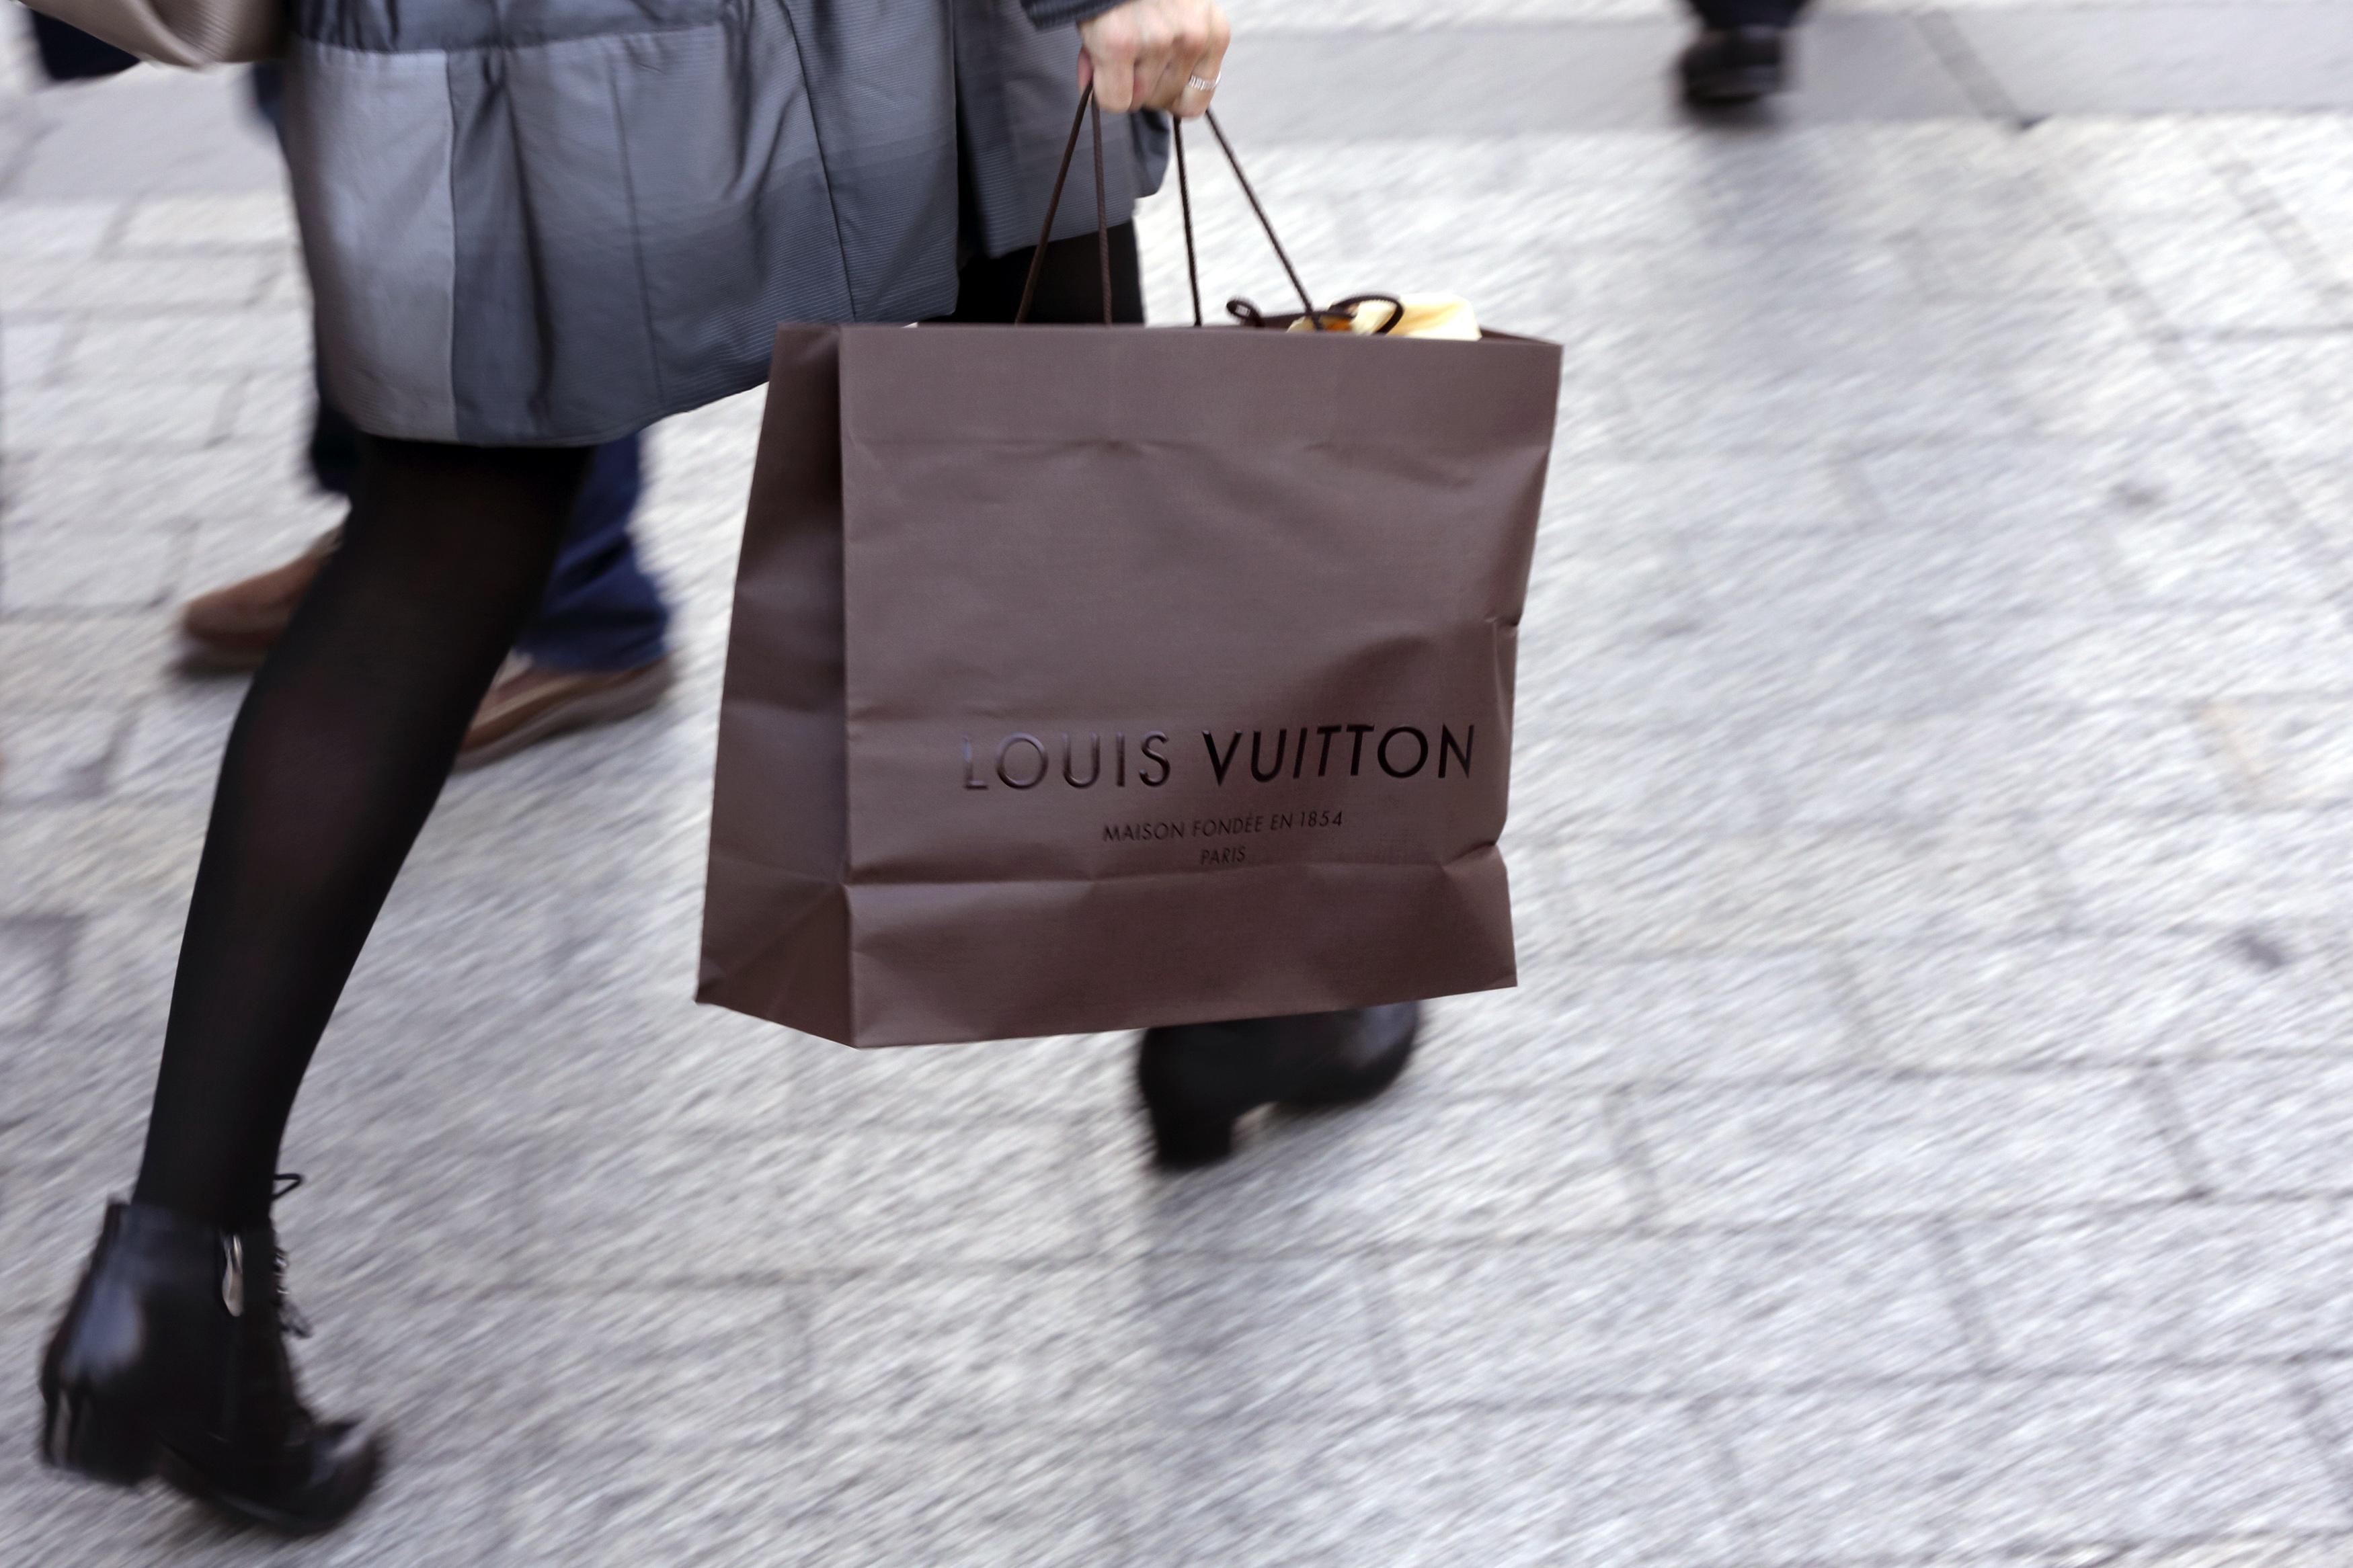 A woman walks with a Louis Vuitton shopping bag as she leaves a Louis Vuitton store in Paris.